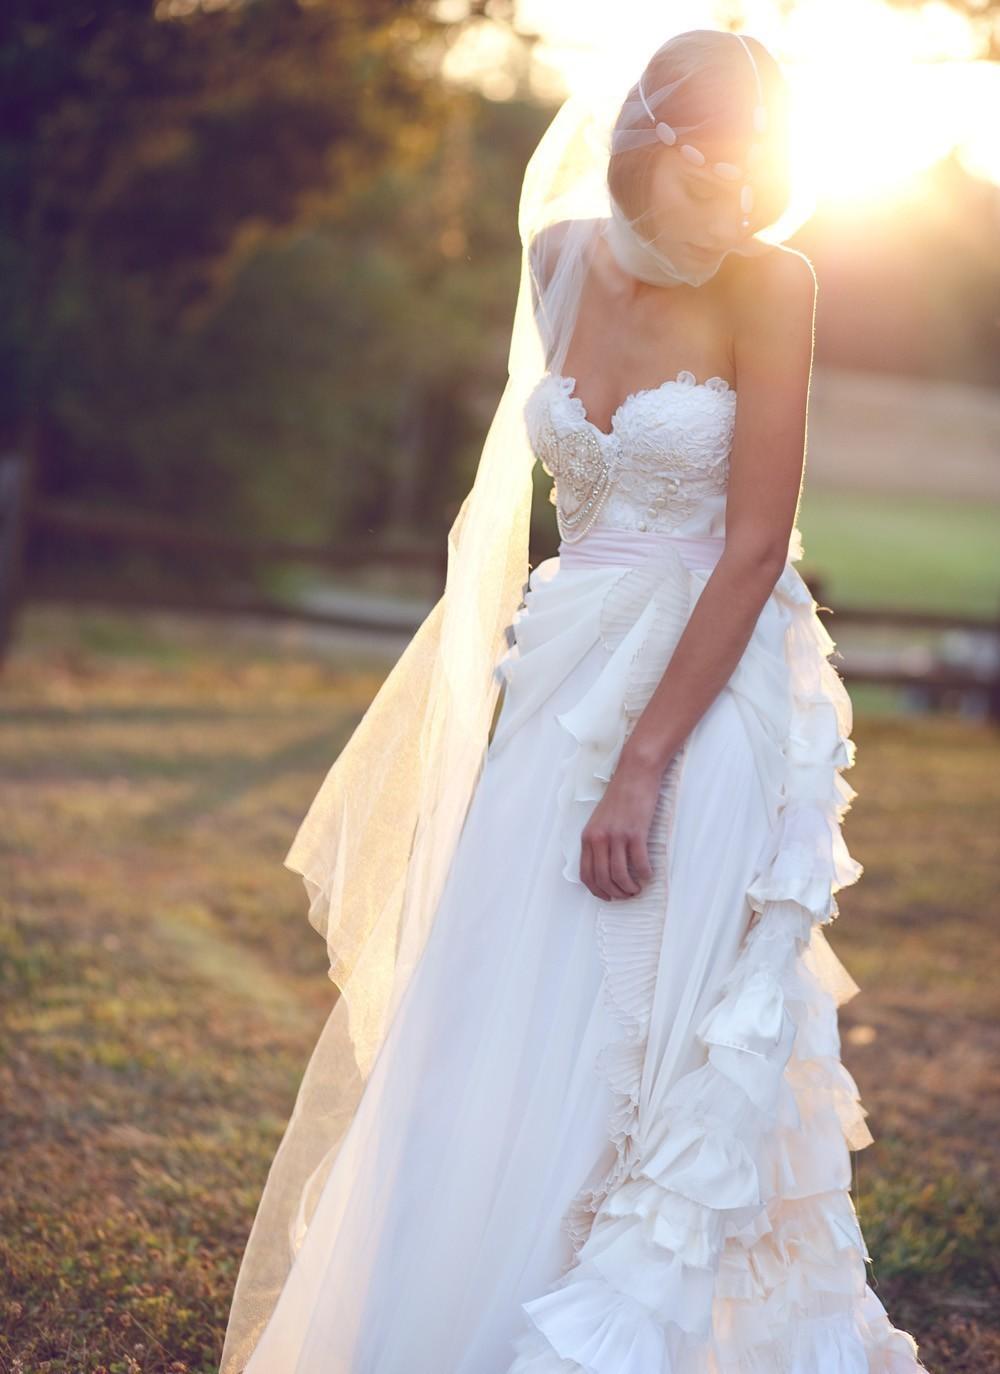 Handmade-wedding-dresses-etsy-bridal-gown-bohemian-claire-lafaye.full